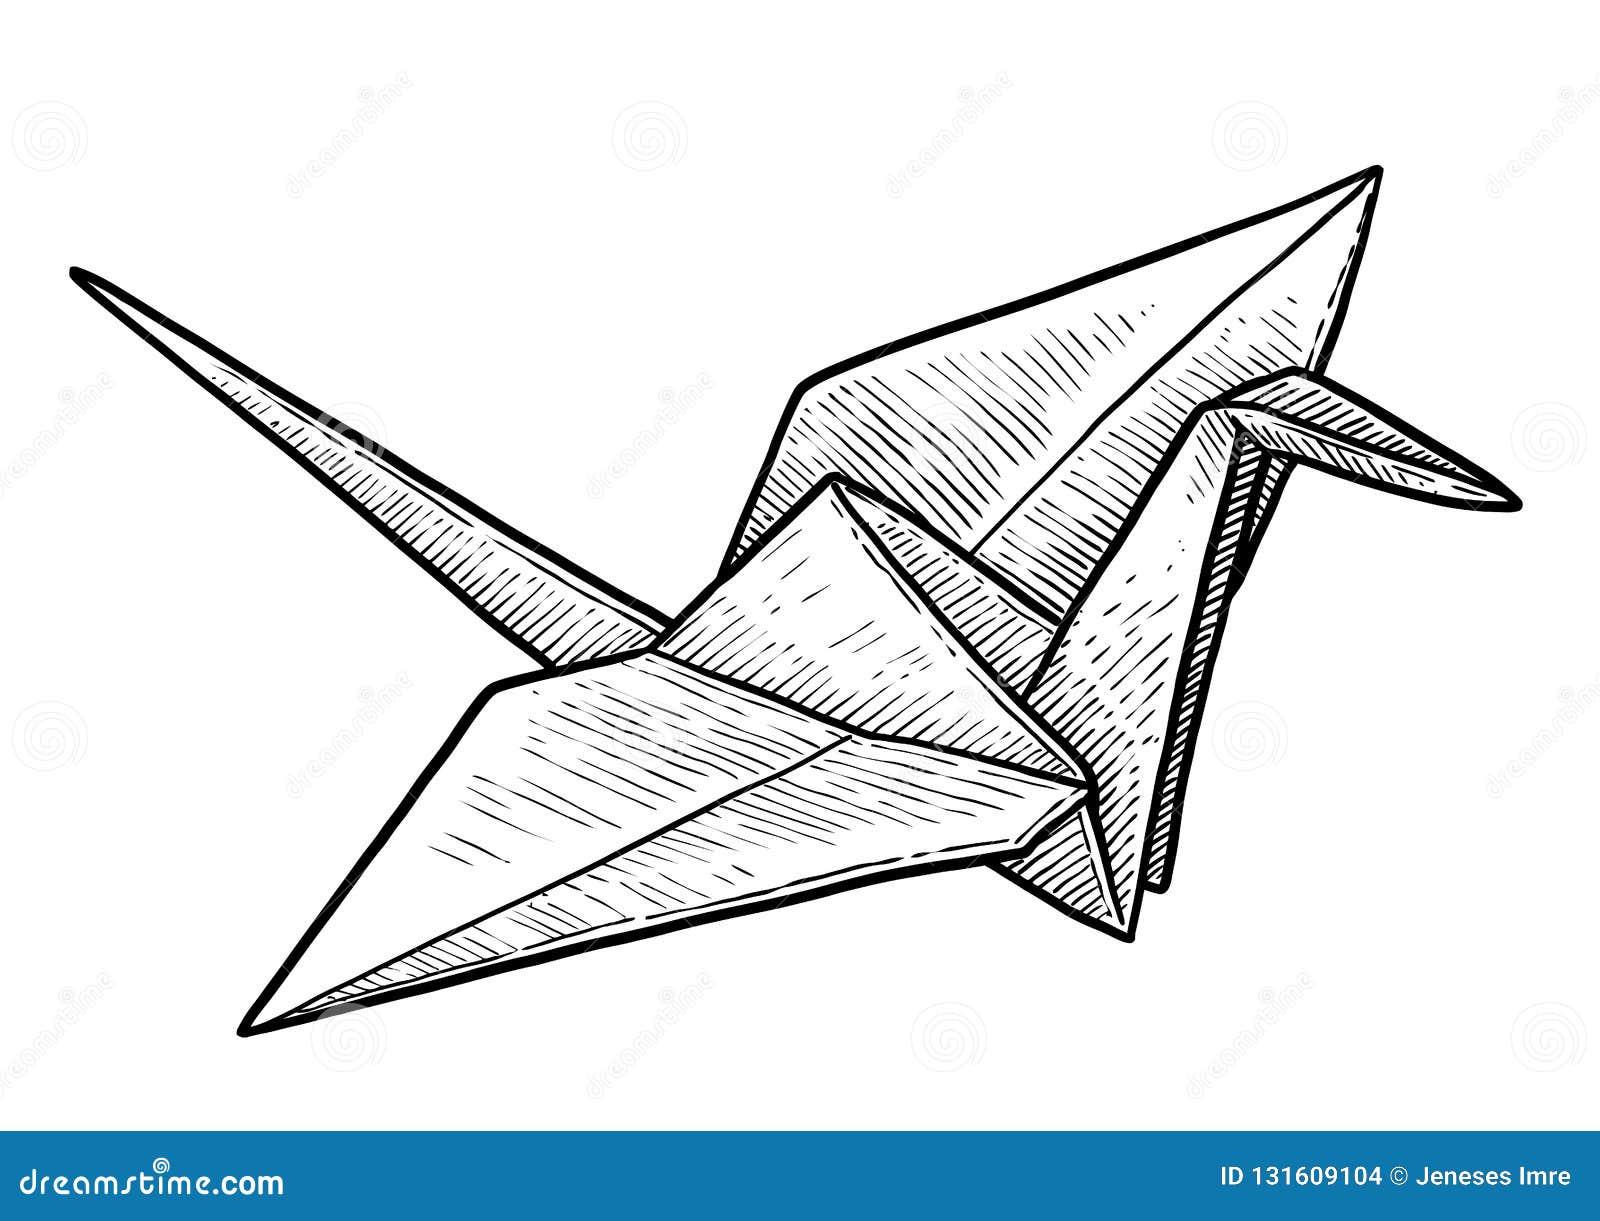 Crane Origami Illustration Drawing Engraving Ink Line Art